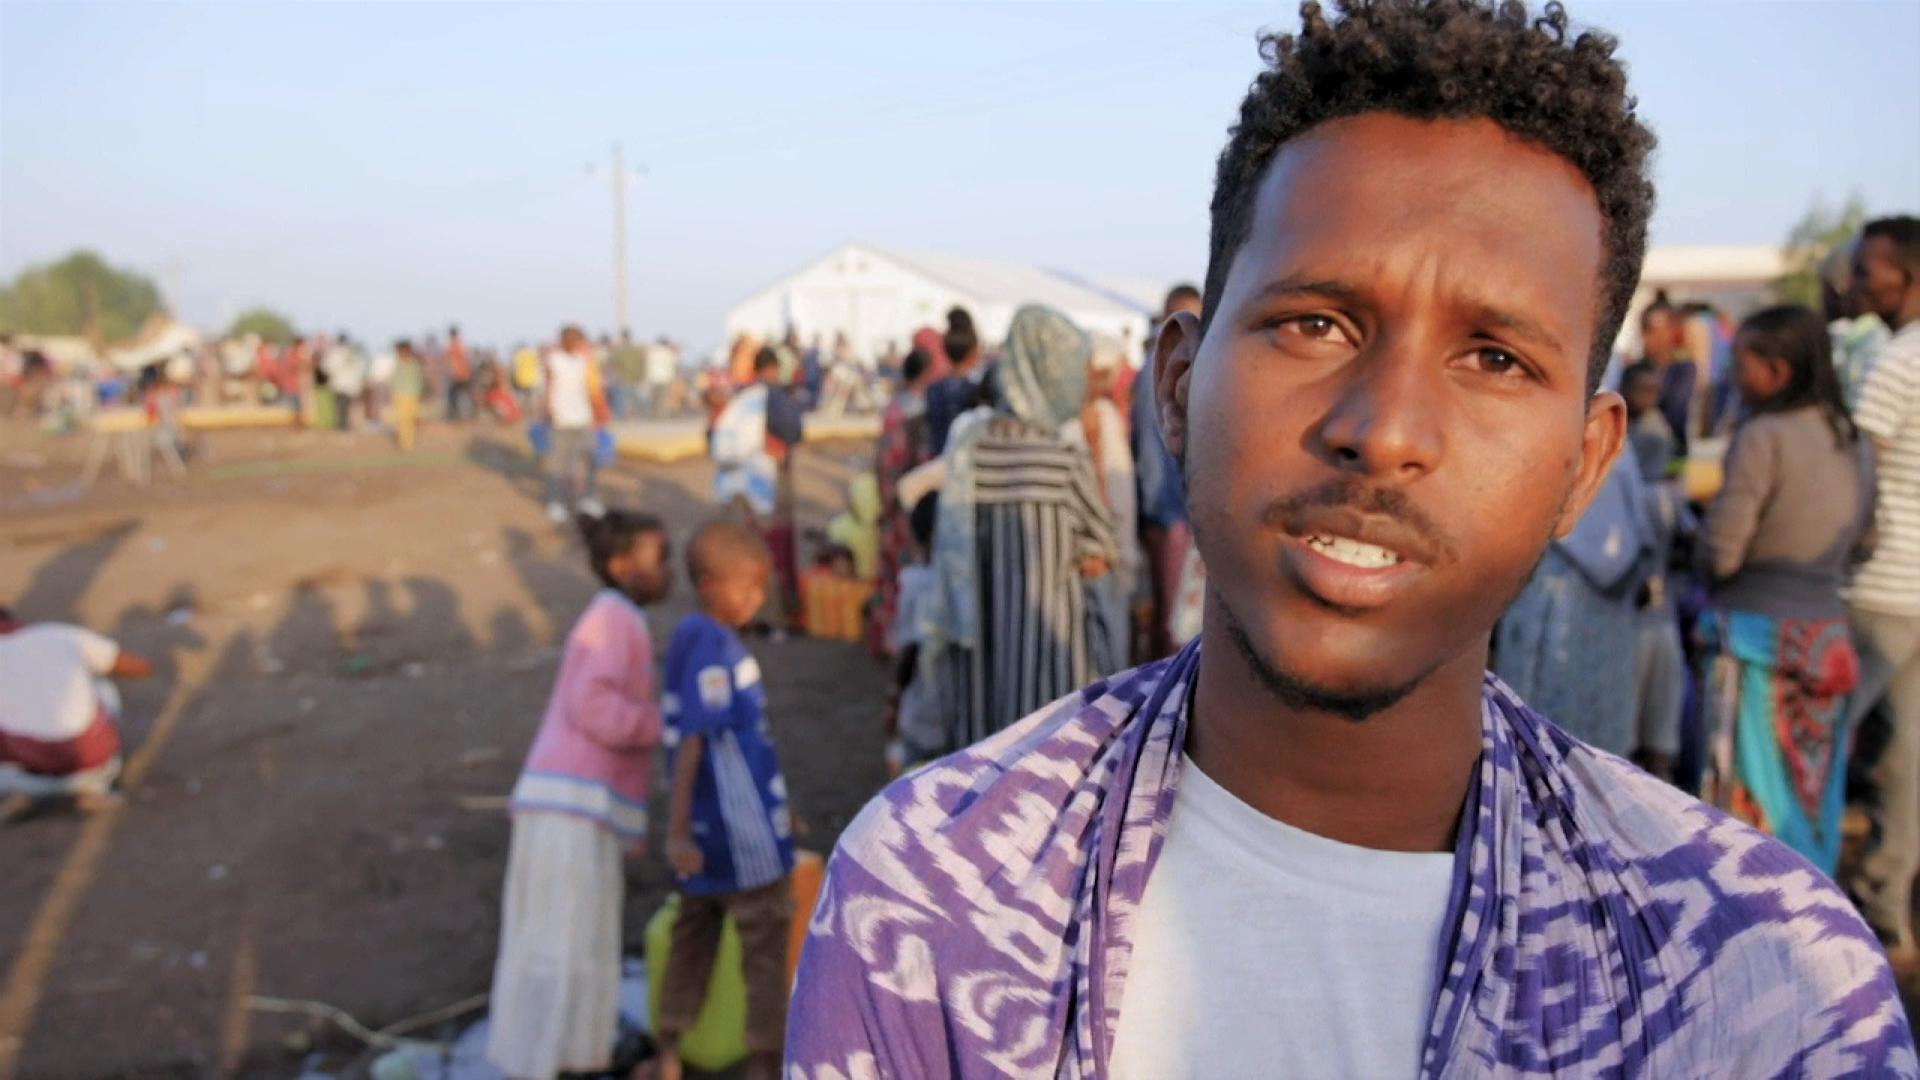 jelj_a_sudan_ethiopian_refugees.mxf_.13_23_13_24.still003_0.png